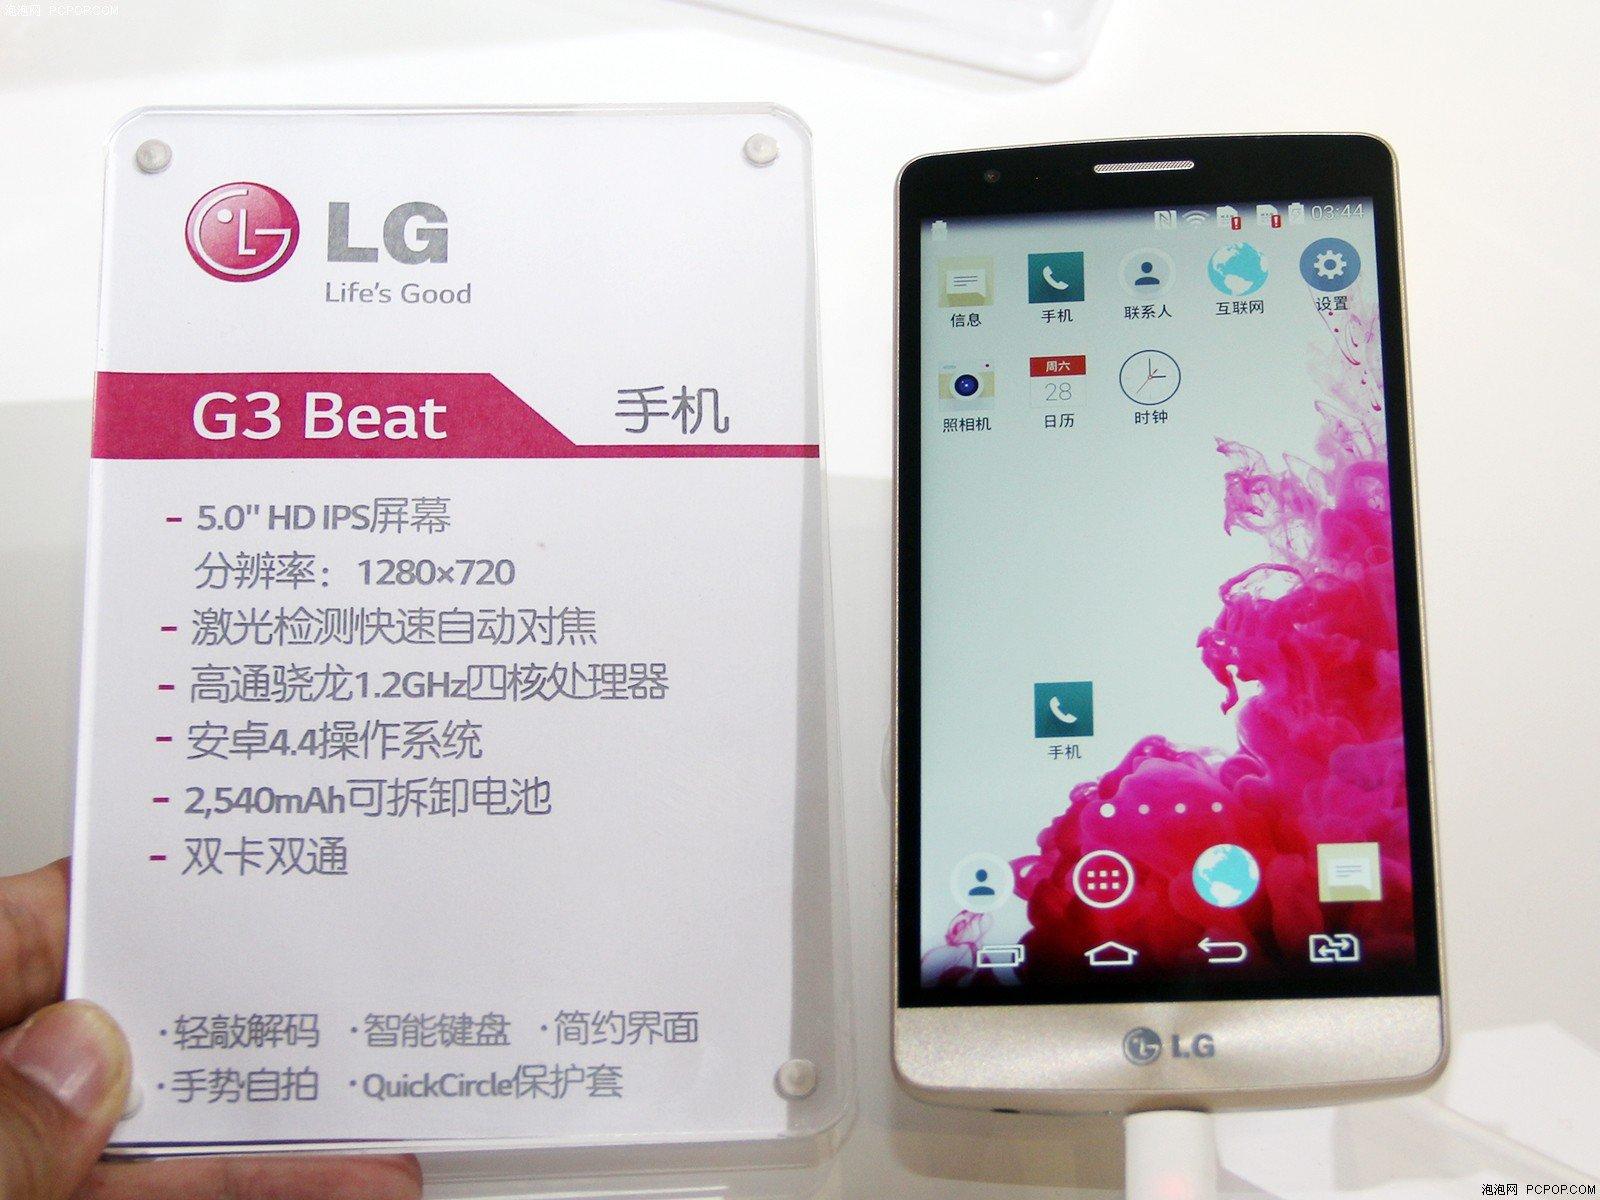 lg g3 beat/mini_featured